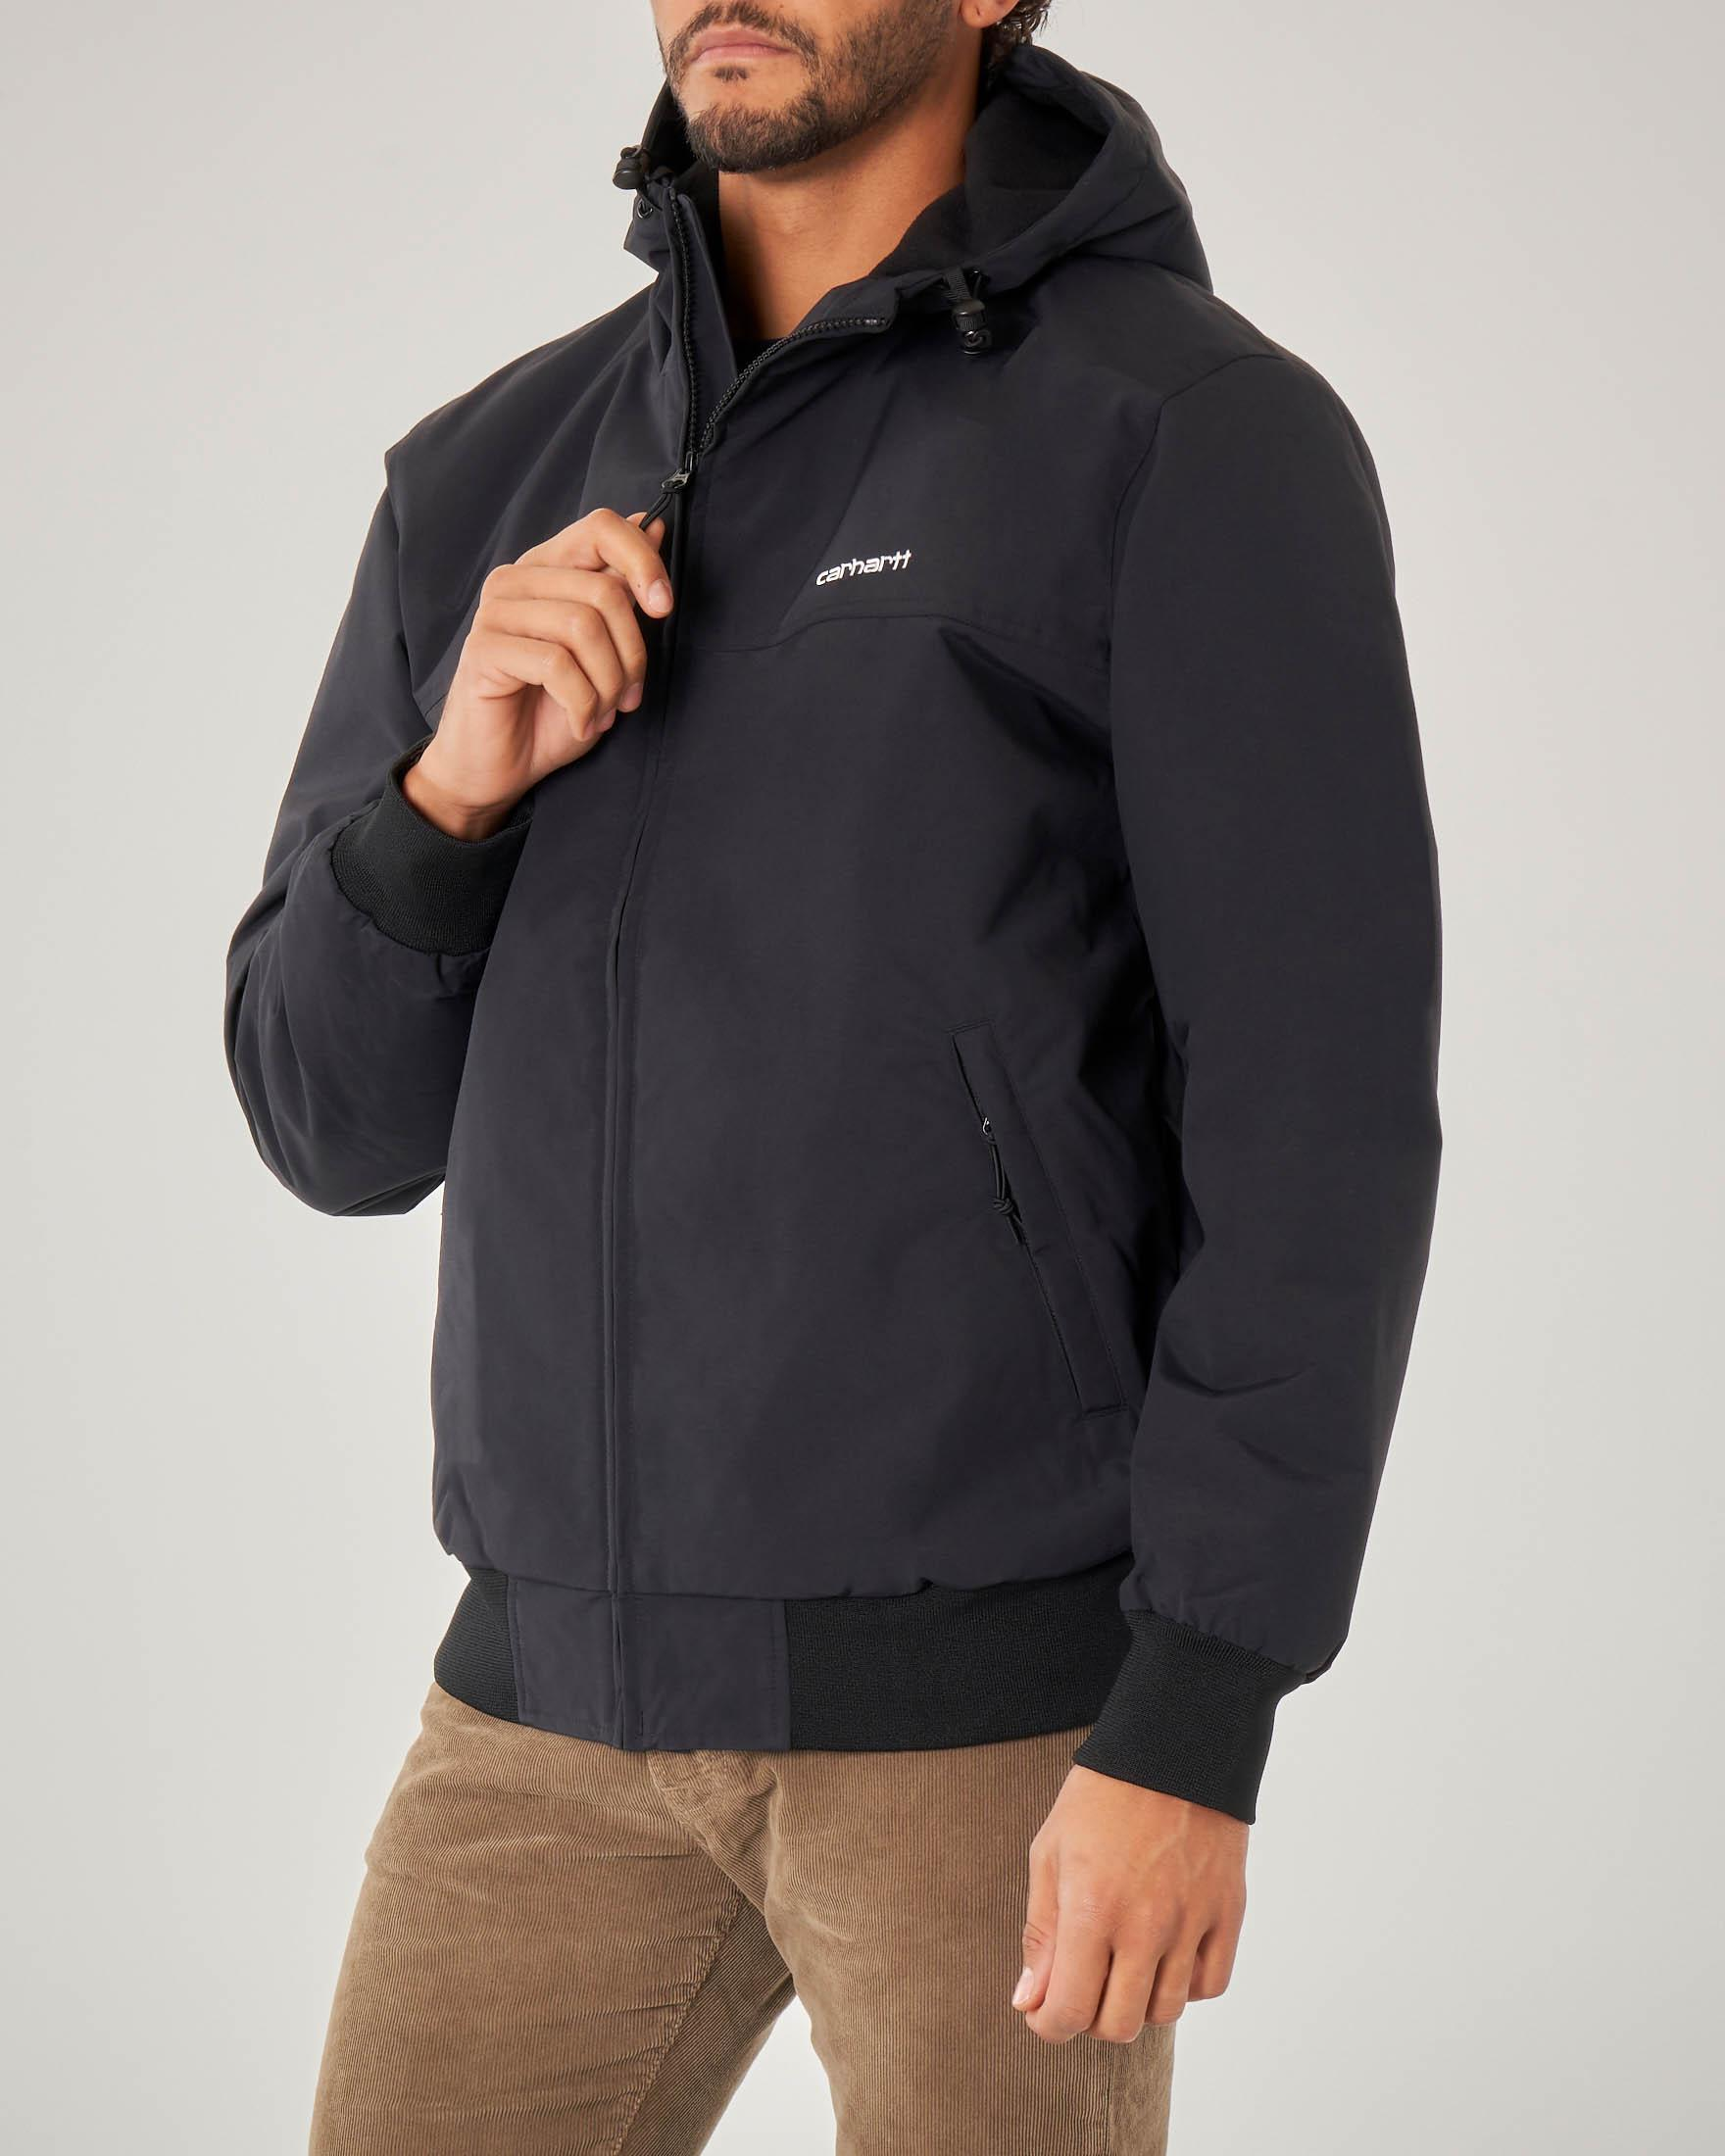 Hooded Sail Jacket nera con cappuccio